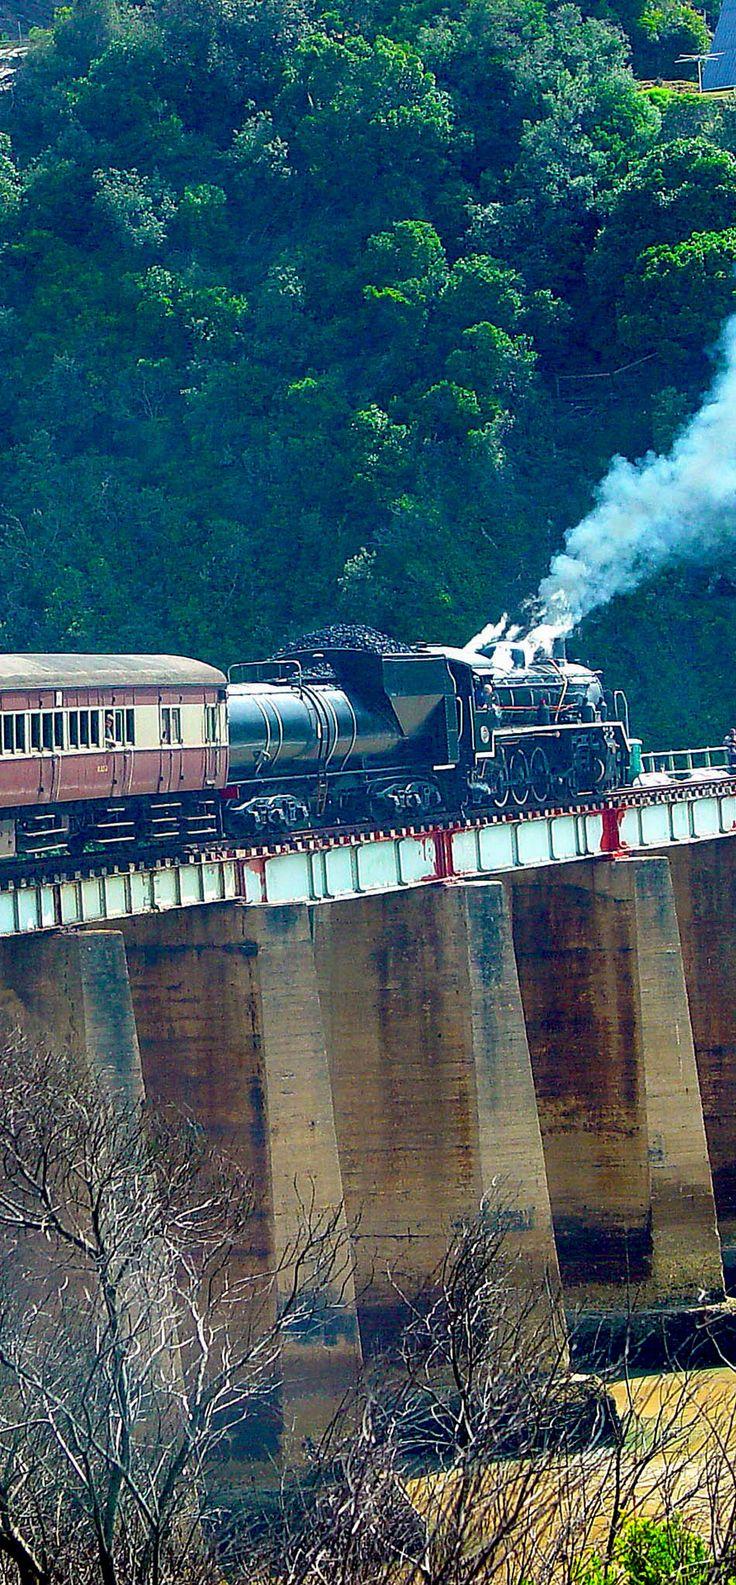 Steamtrain Outeniqua Choo-Tjoe - ofrece a los pasajeros un viaje de 52 kilometros único, pintoresco y paisajístico, Sudáfrica